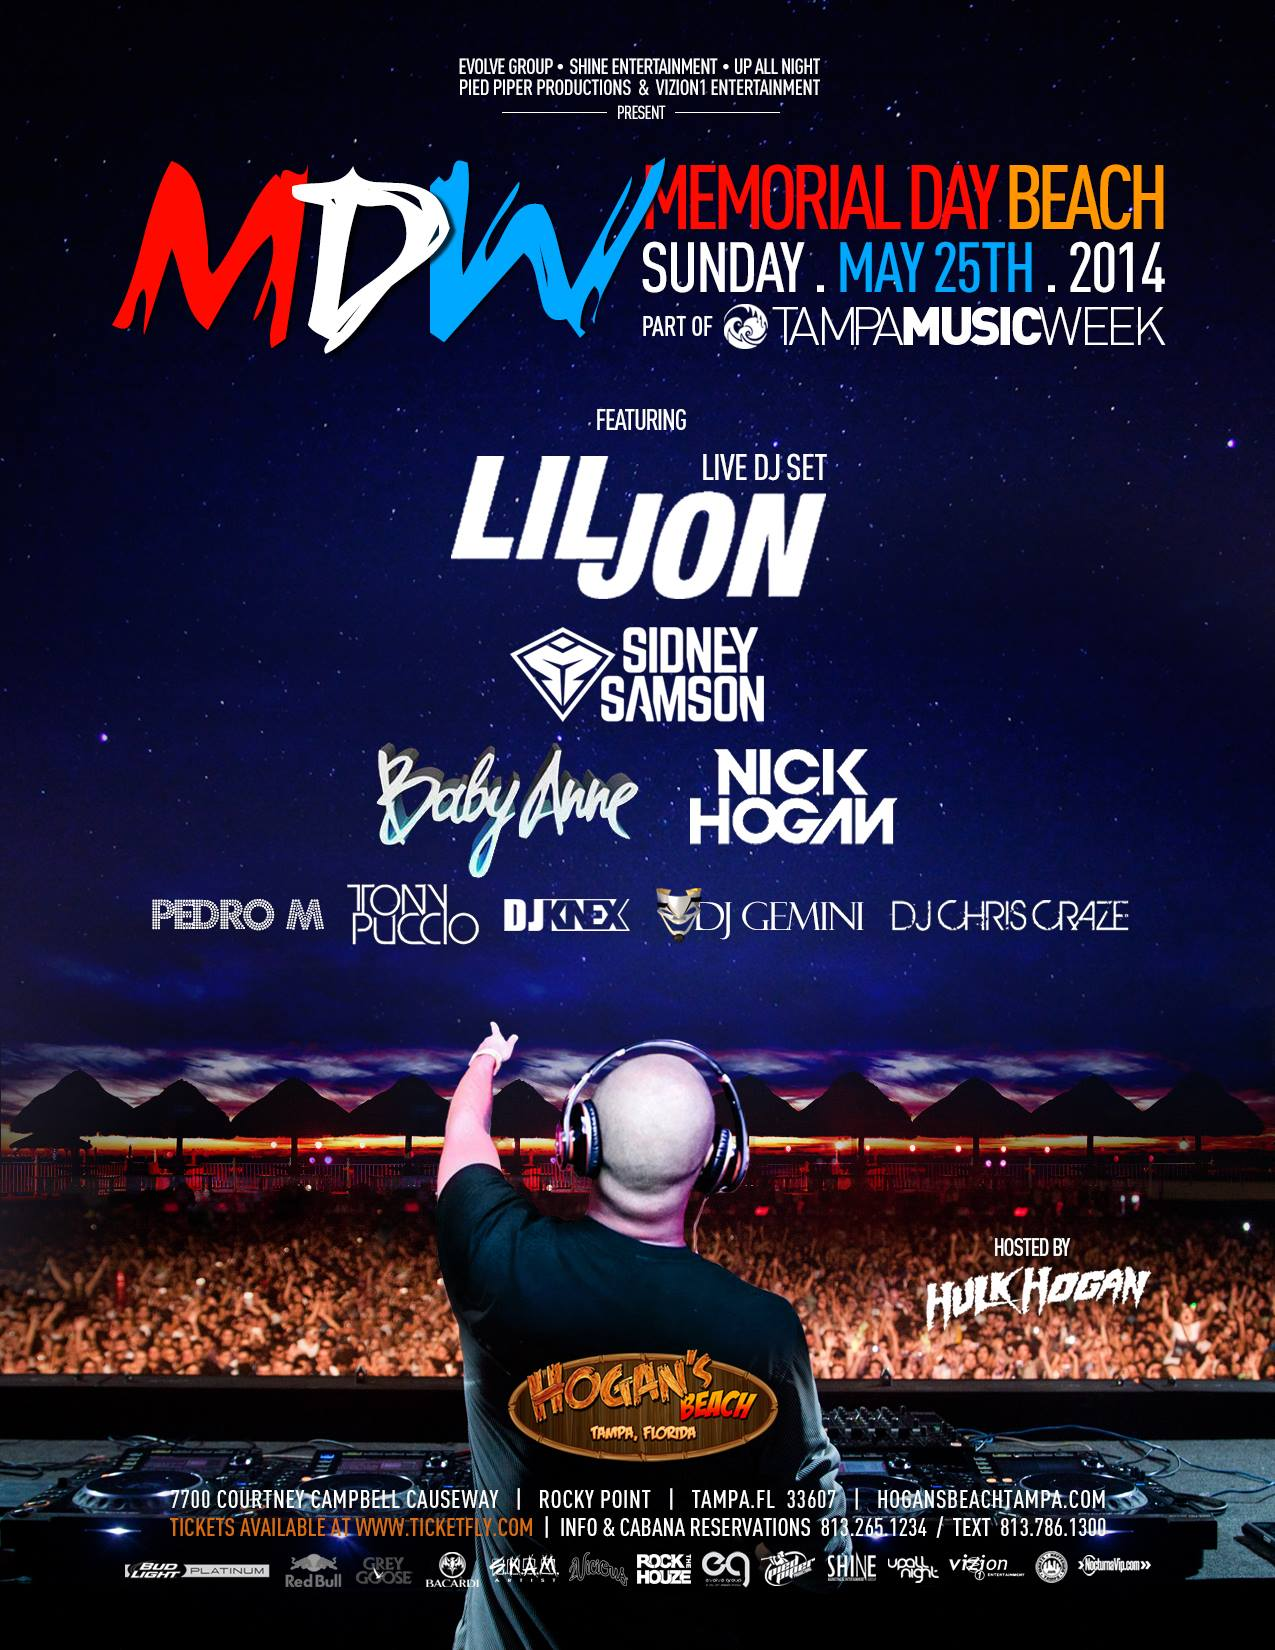 Sunday May 25th - MDW at Hogan's Beach w/ Sidney Samson and Lil Jon